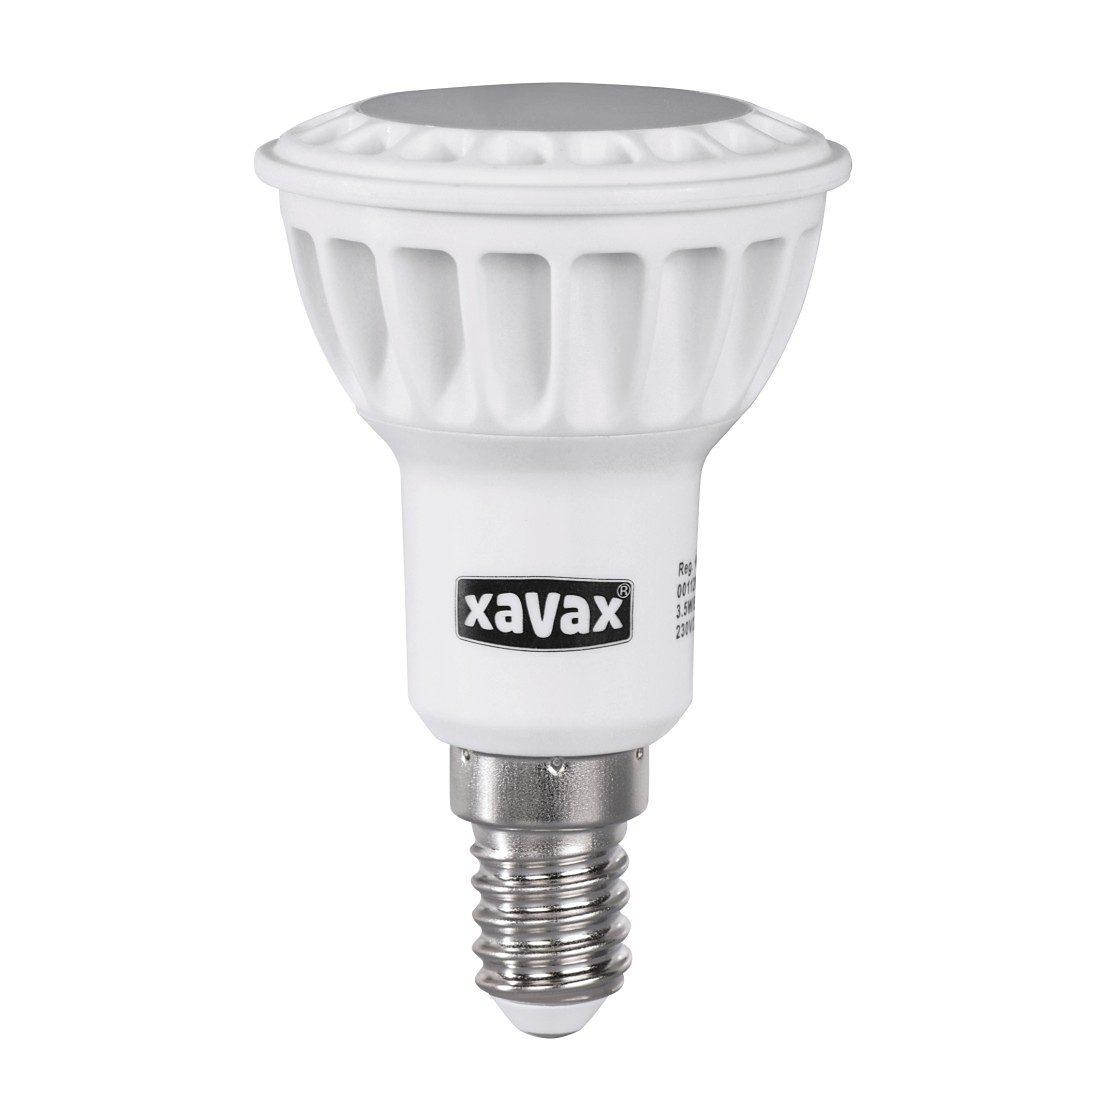 Xavax LED-Lampe, 3,5 W, PAR 16, Warmweiß